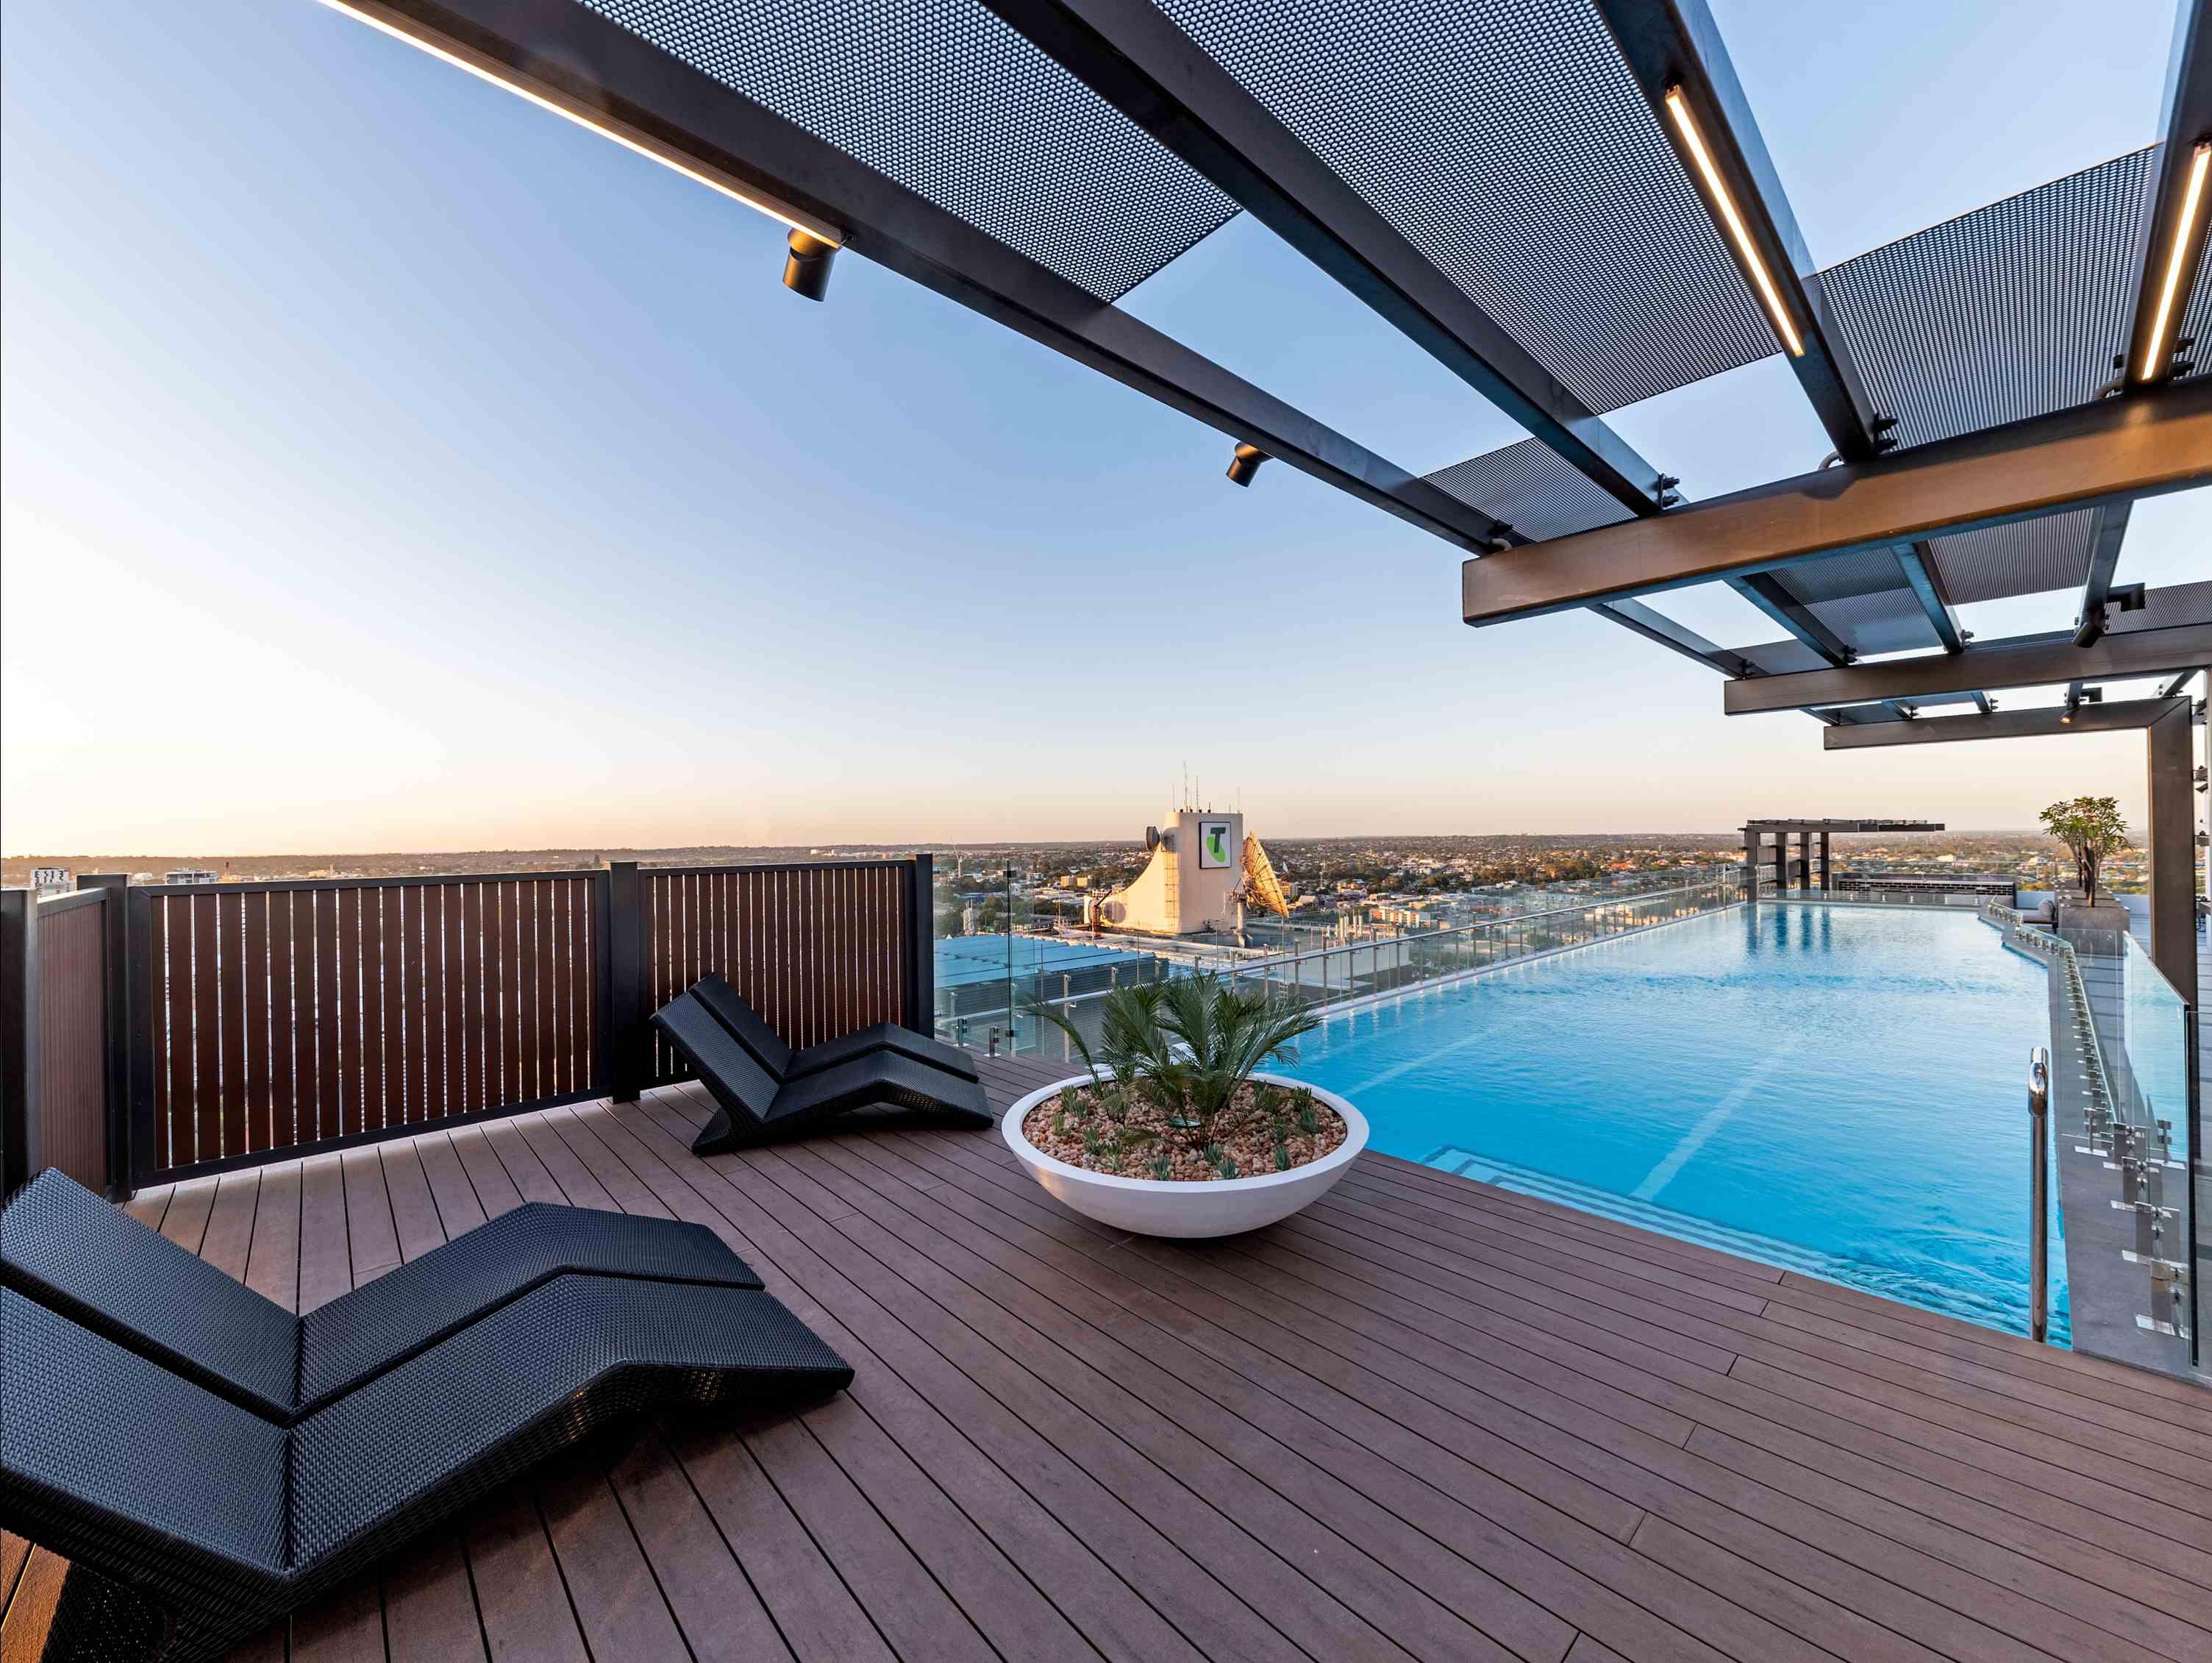 NV Apartments - CBD, Perth - Reapfield Property ...